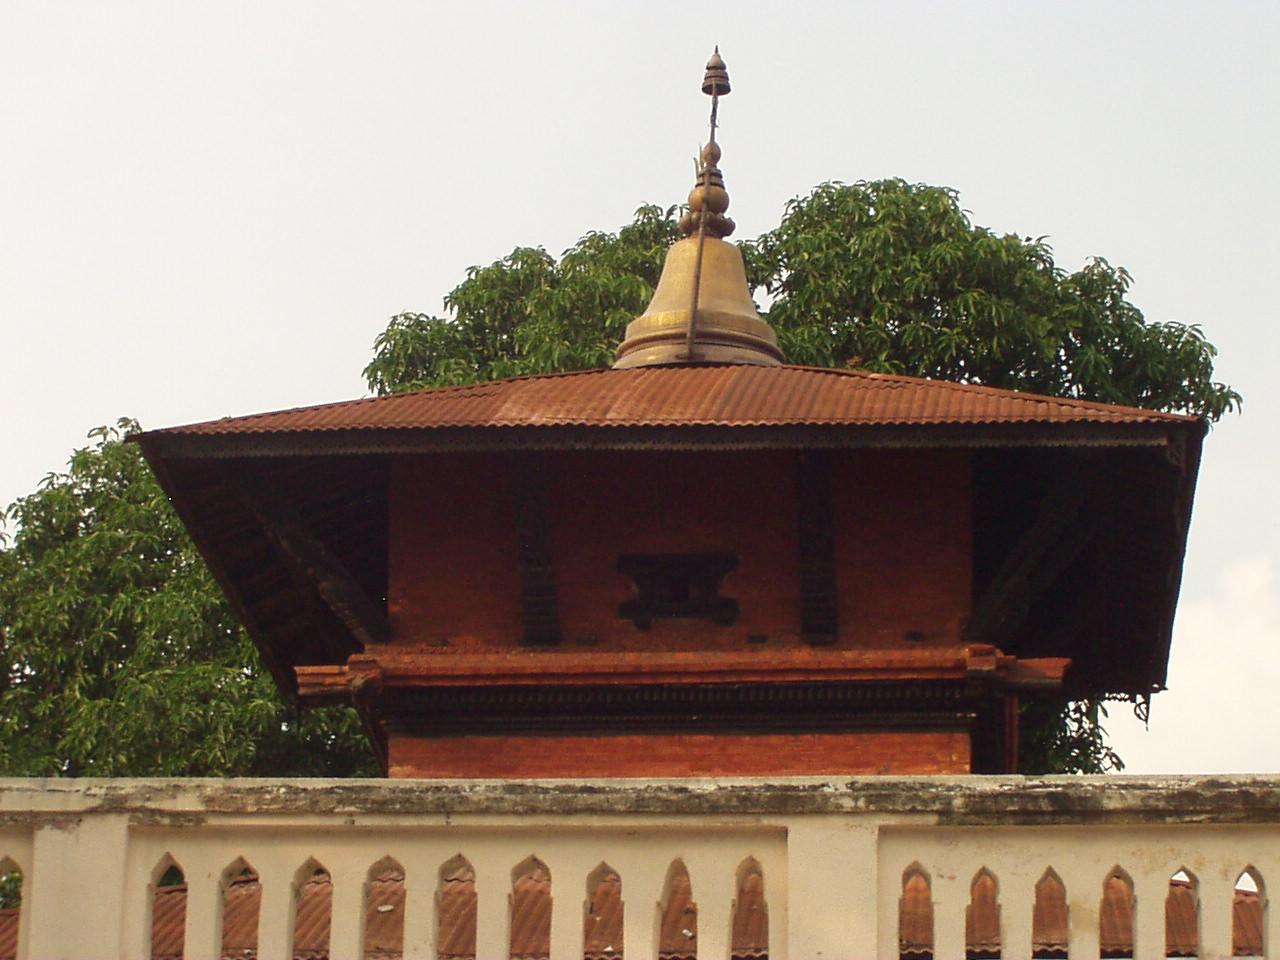 hajipur on JumPic com